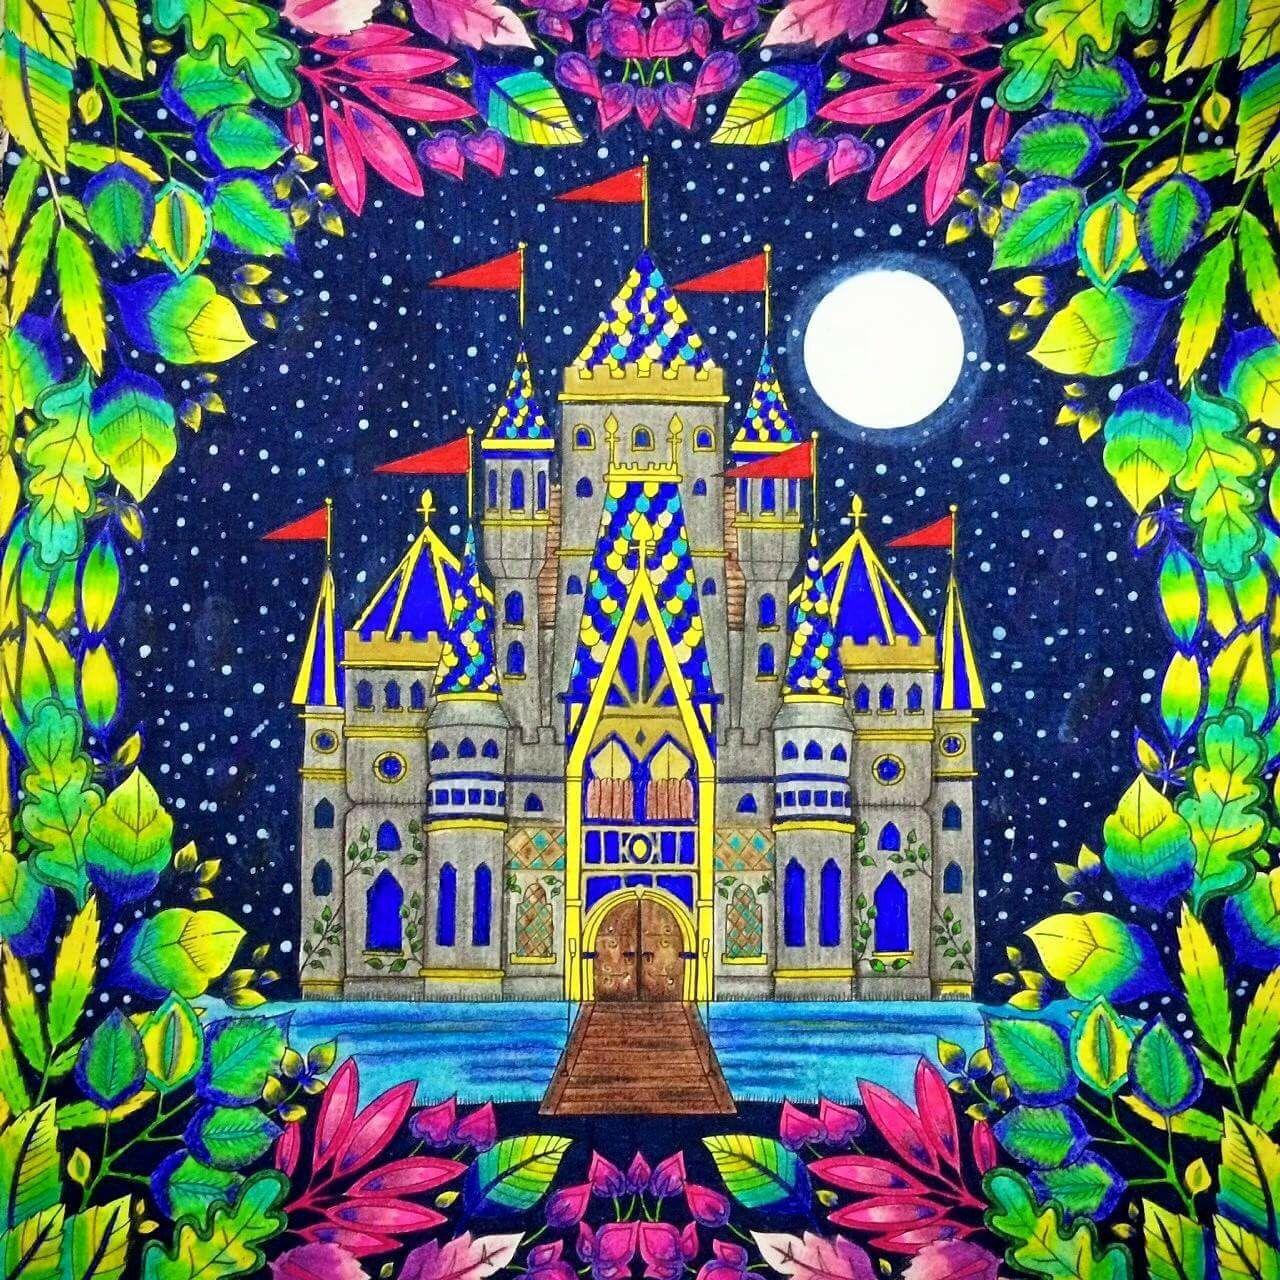 Zendoodle coloring enchanting gardens - Castle Leaves Enchanted Forest Castelo Floresta Encantada Johanna Basford